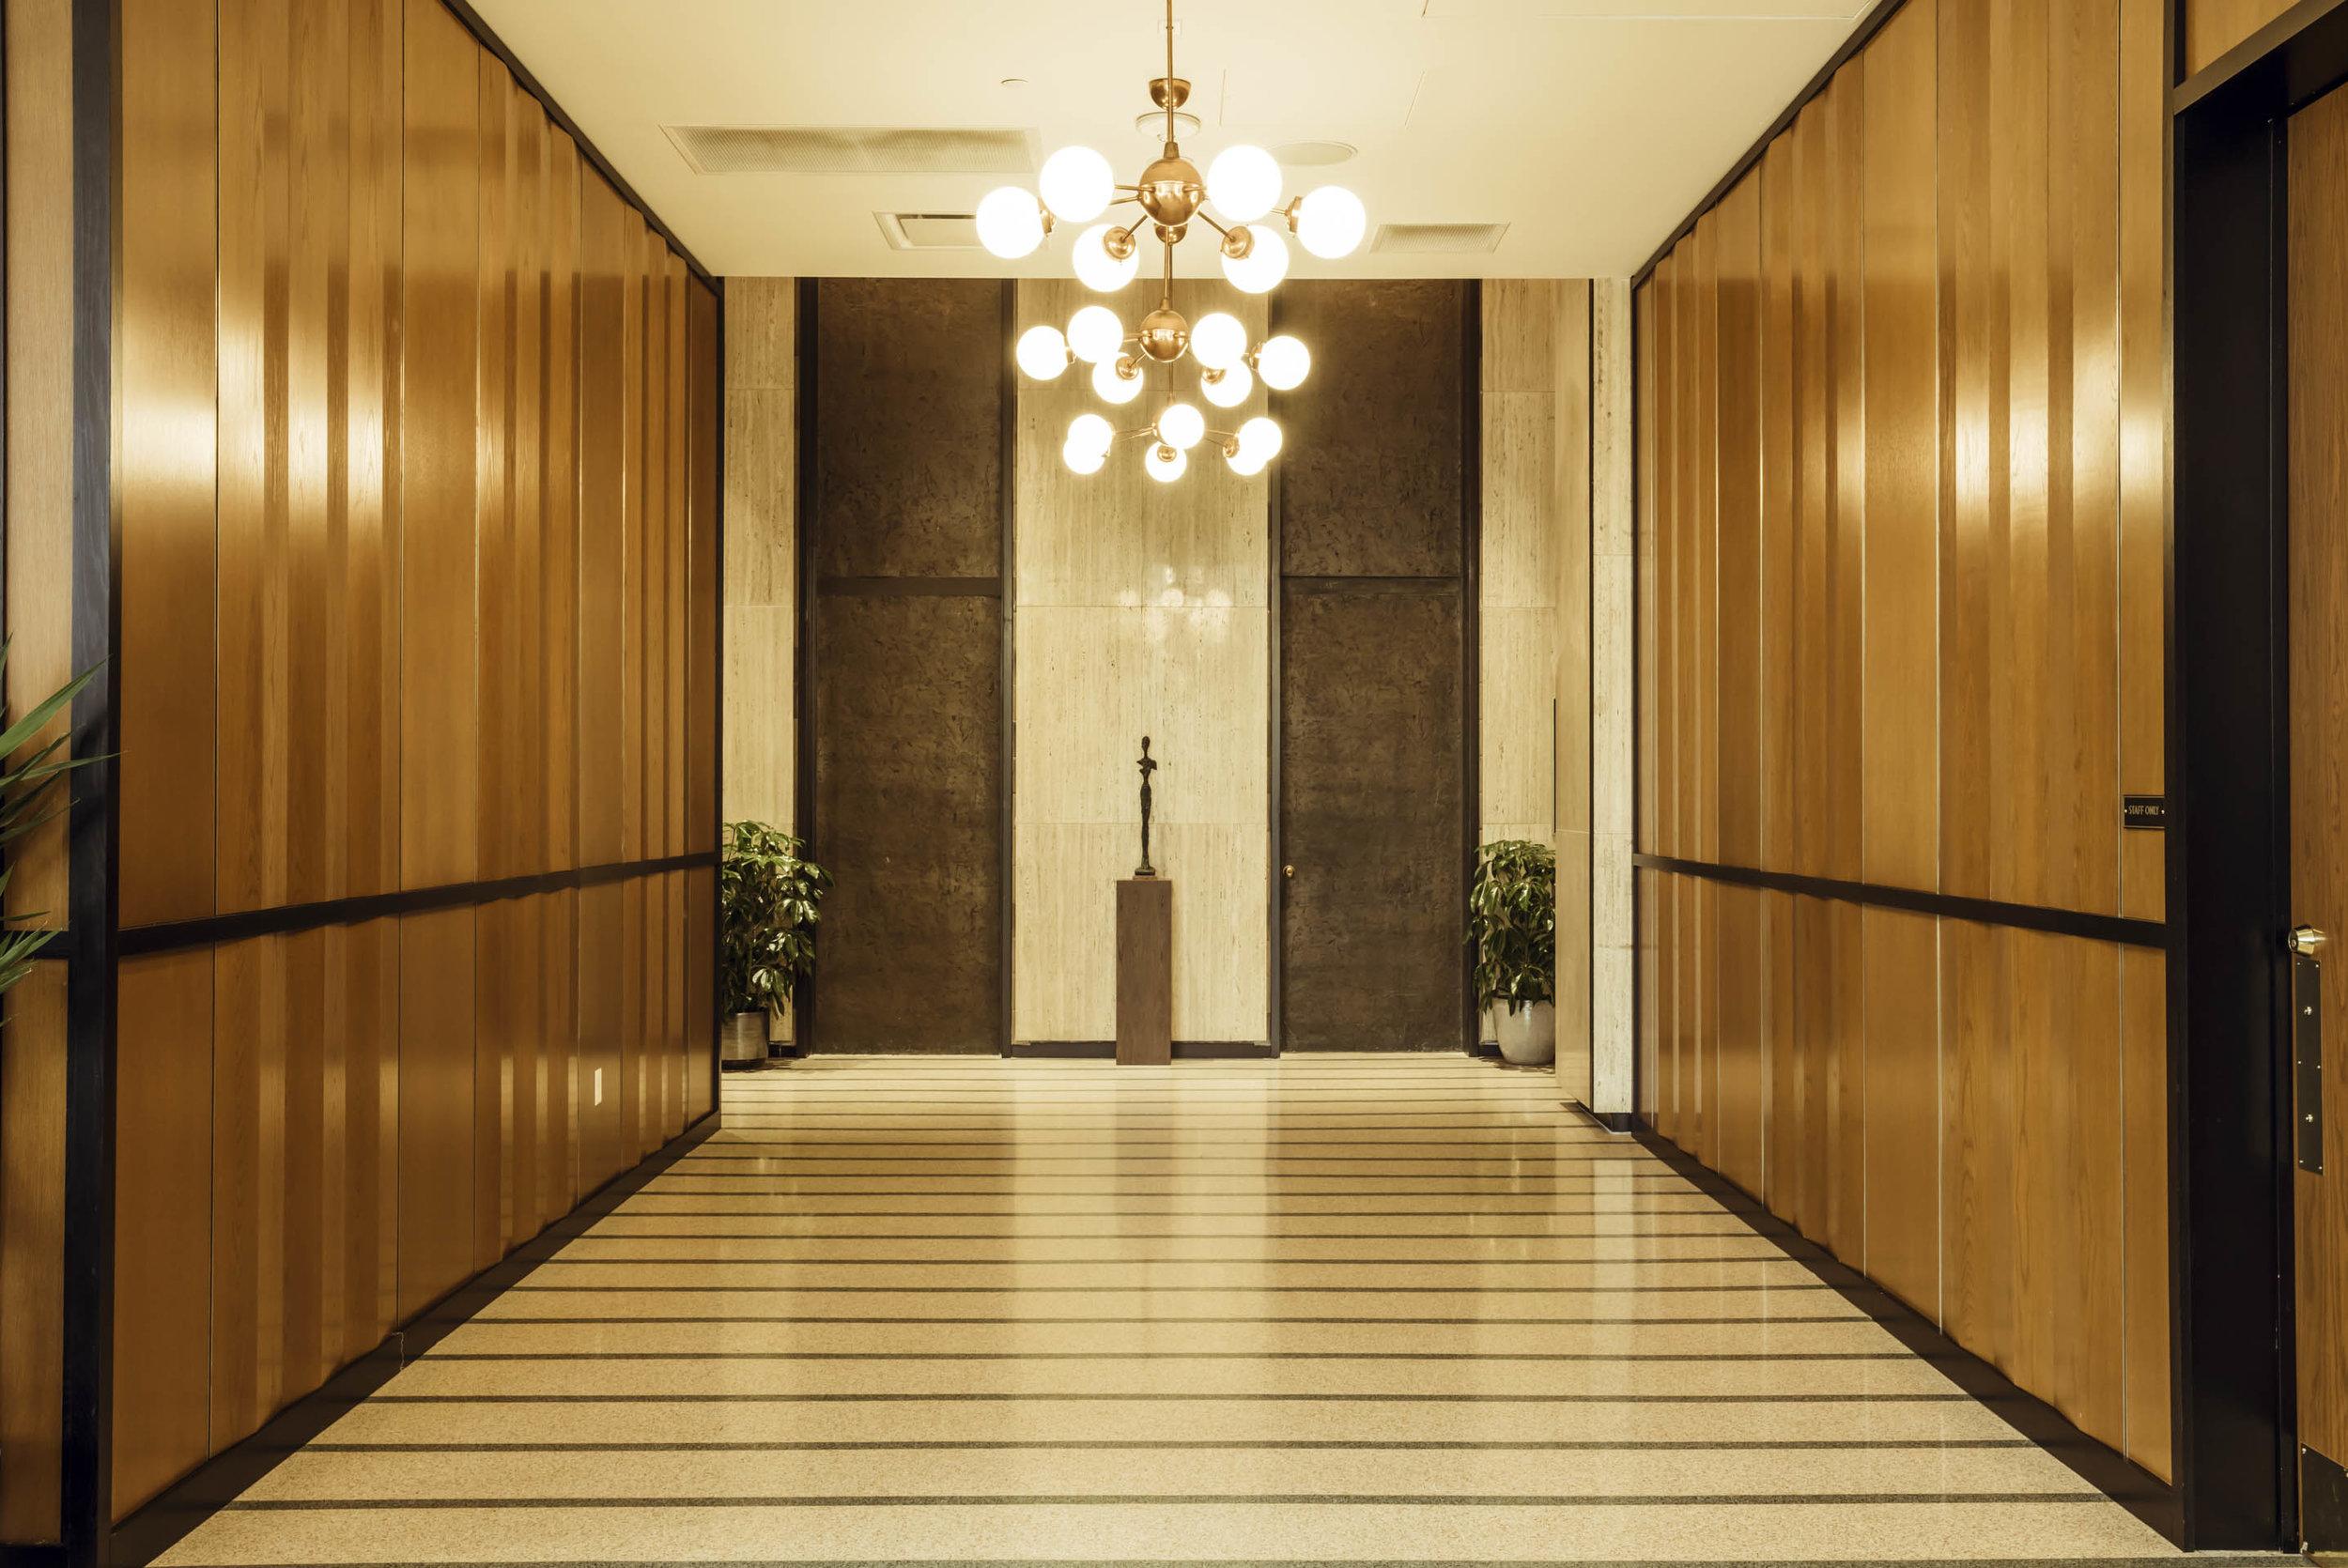 FAIRLANE HOTEL ARCHITECTURE WEB RES-12.jpg